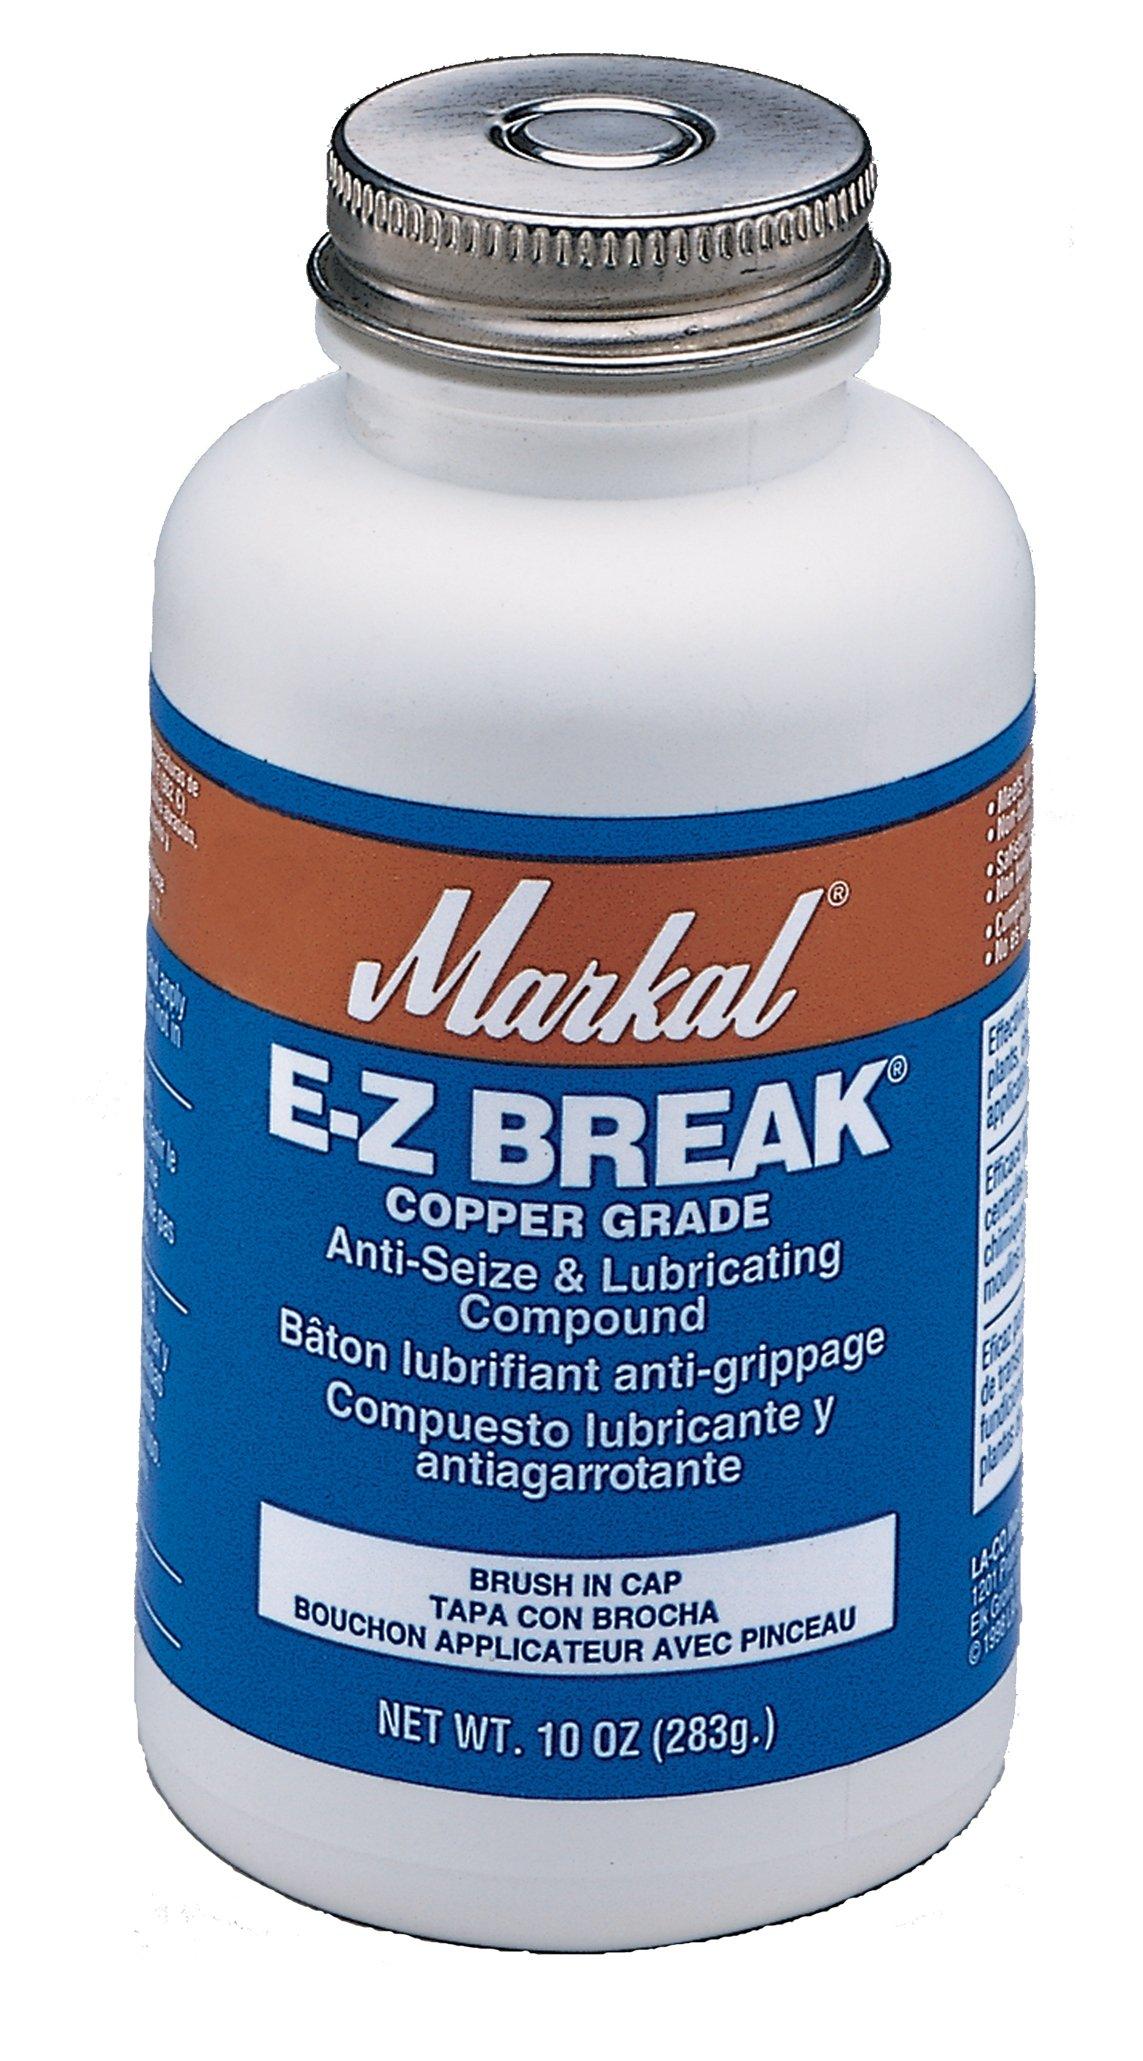 Markal EZ Break Copper Grade Antiseize Paste, 1800 Degree F Temperature, 425 lbs